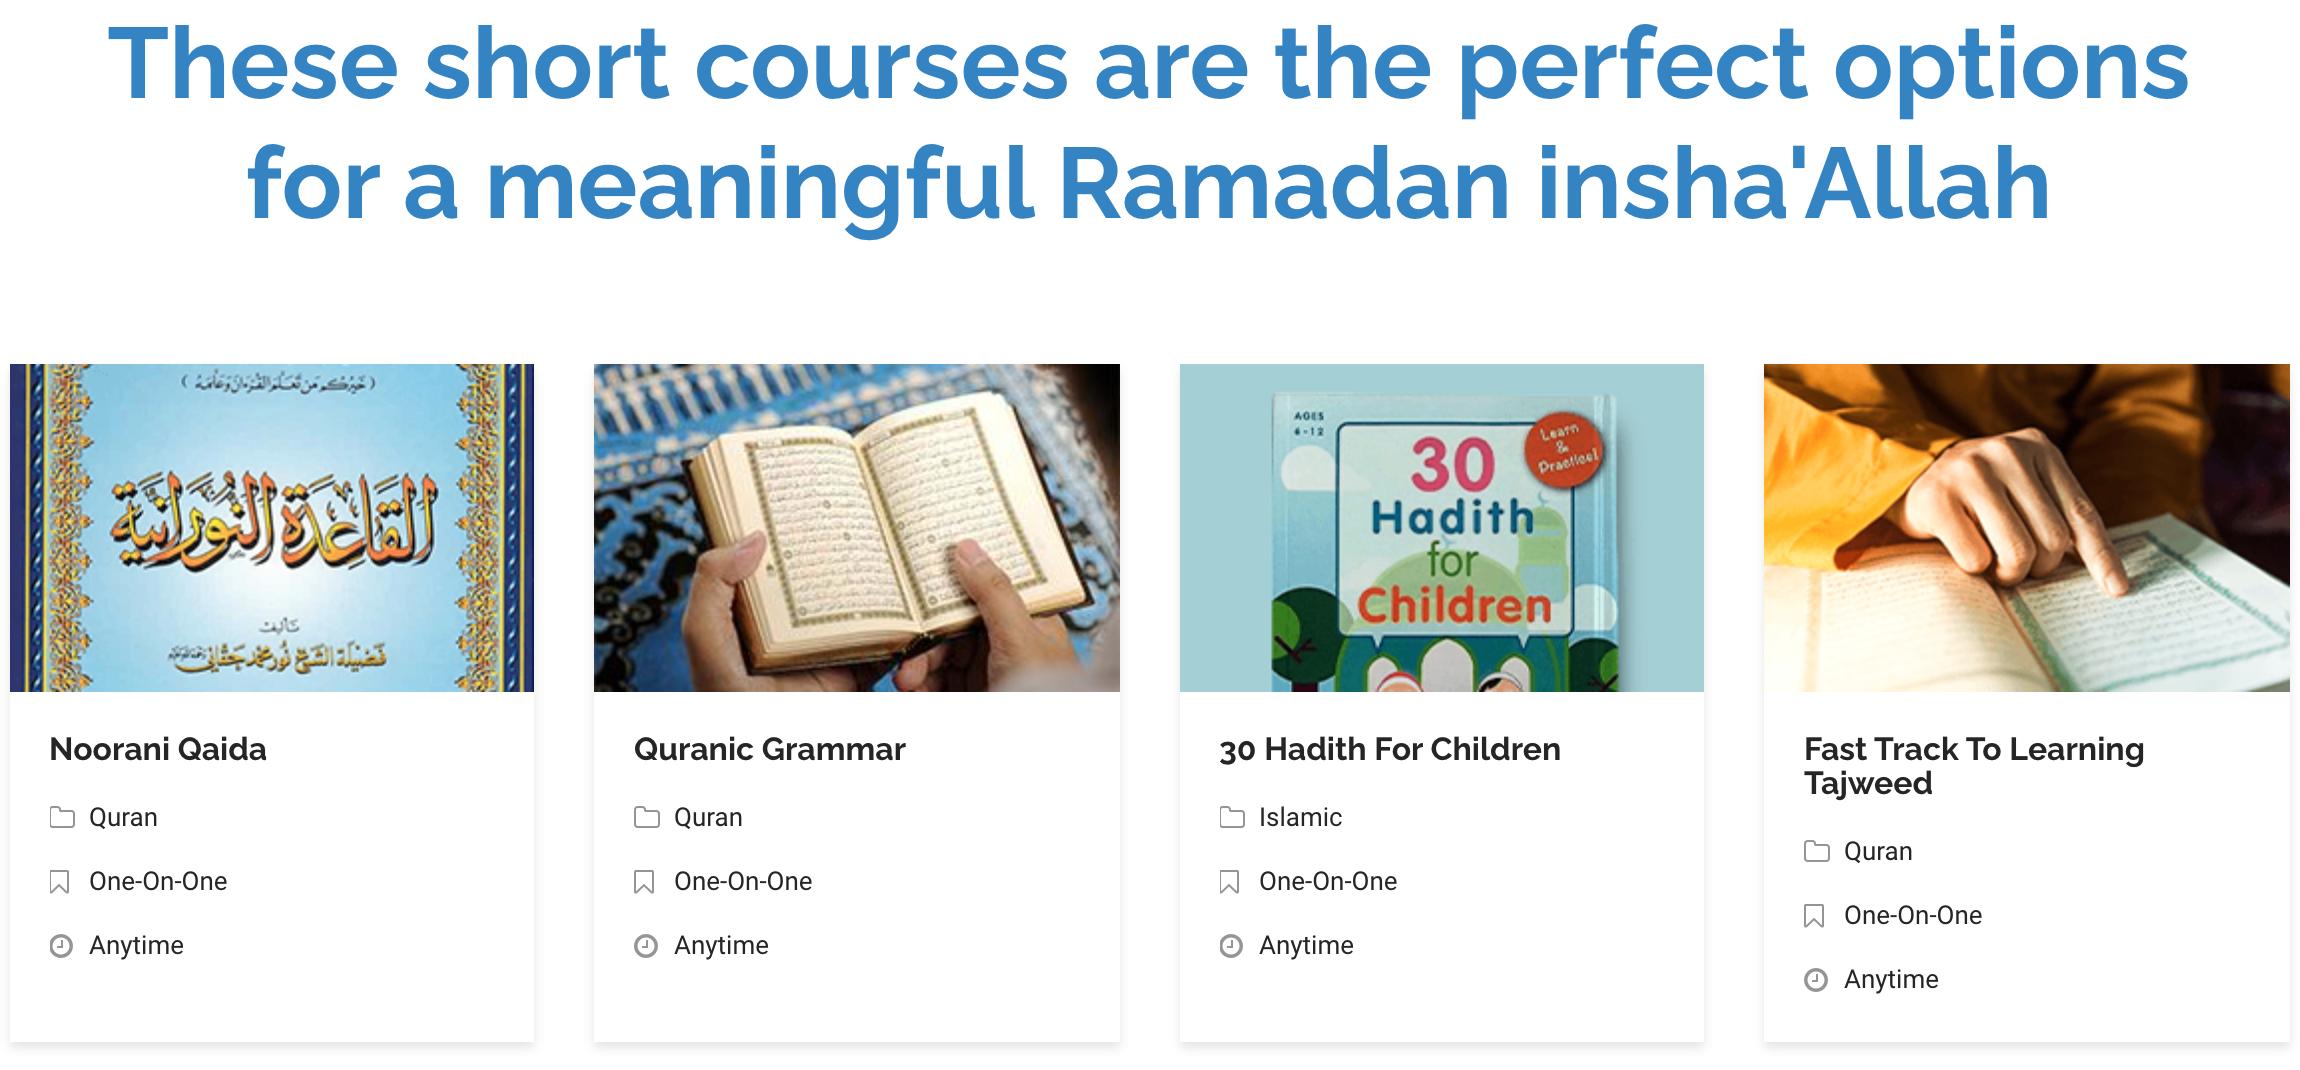 Studio Arabiya Islamic online resources this Ramadan 2021